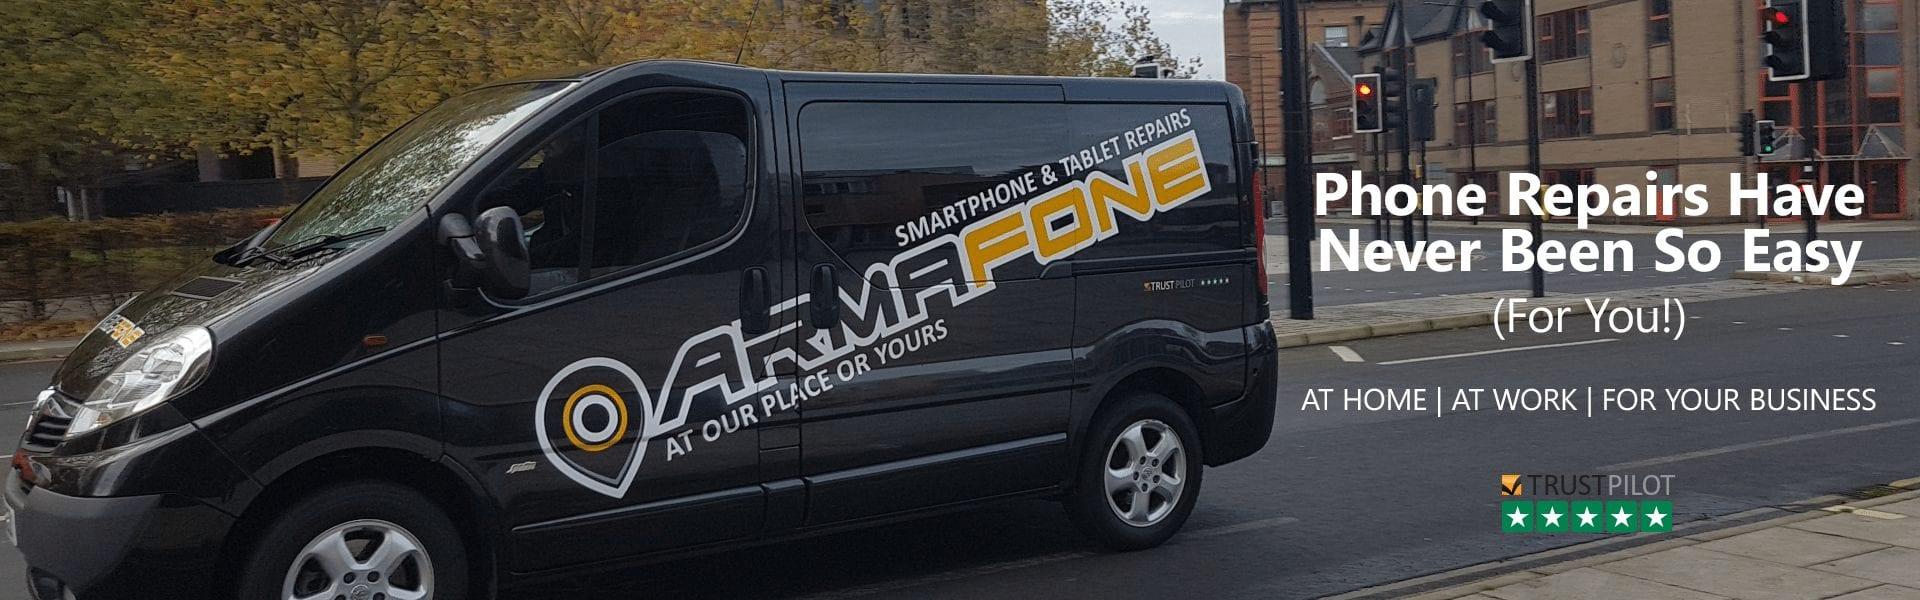 ArmaFone phone repair call out service header image